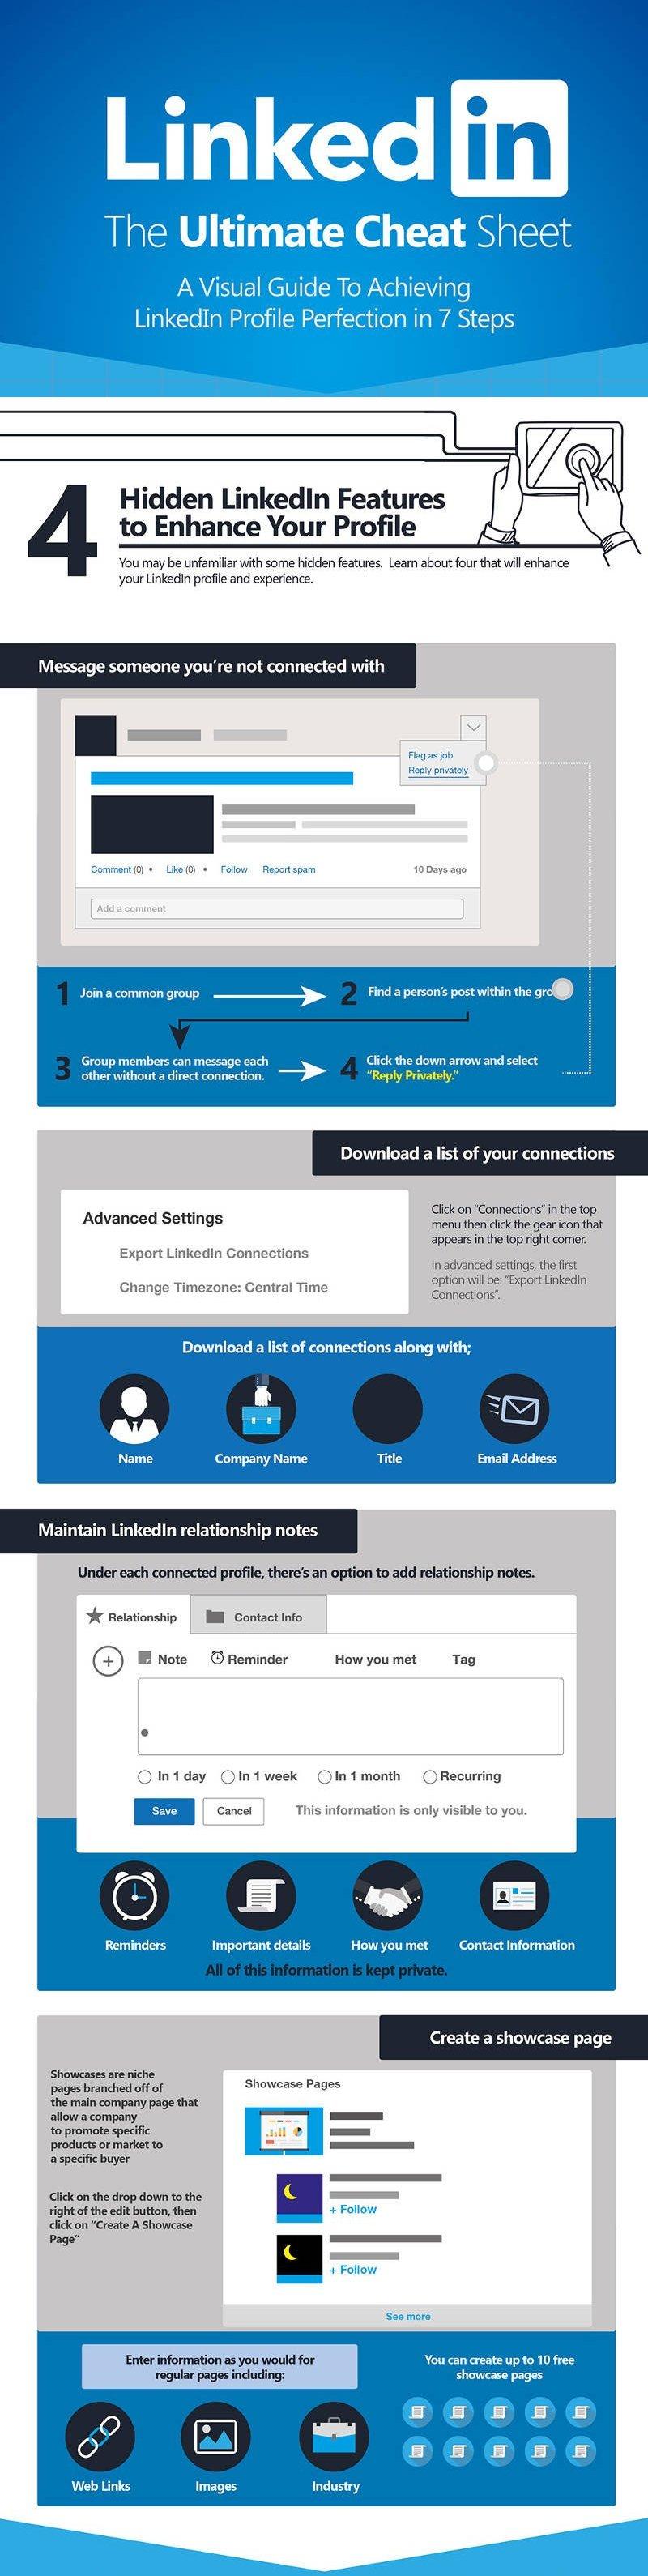 linkedin marketing cheat sheet